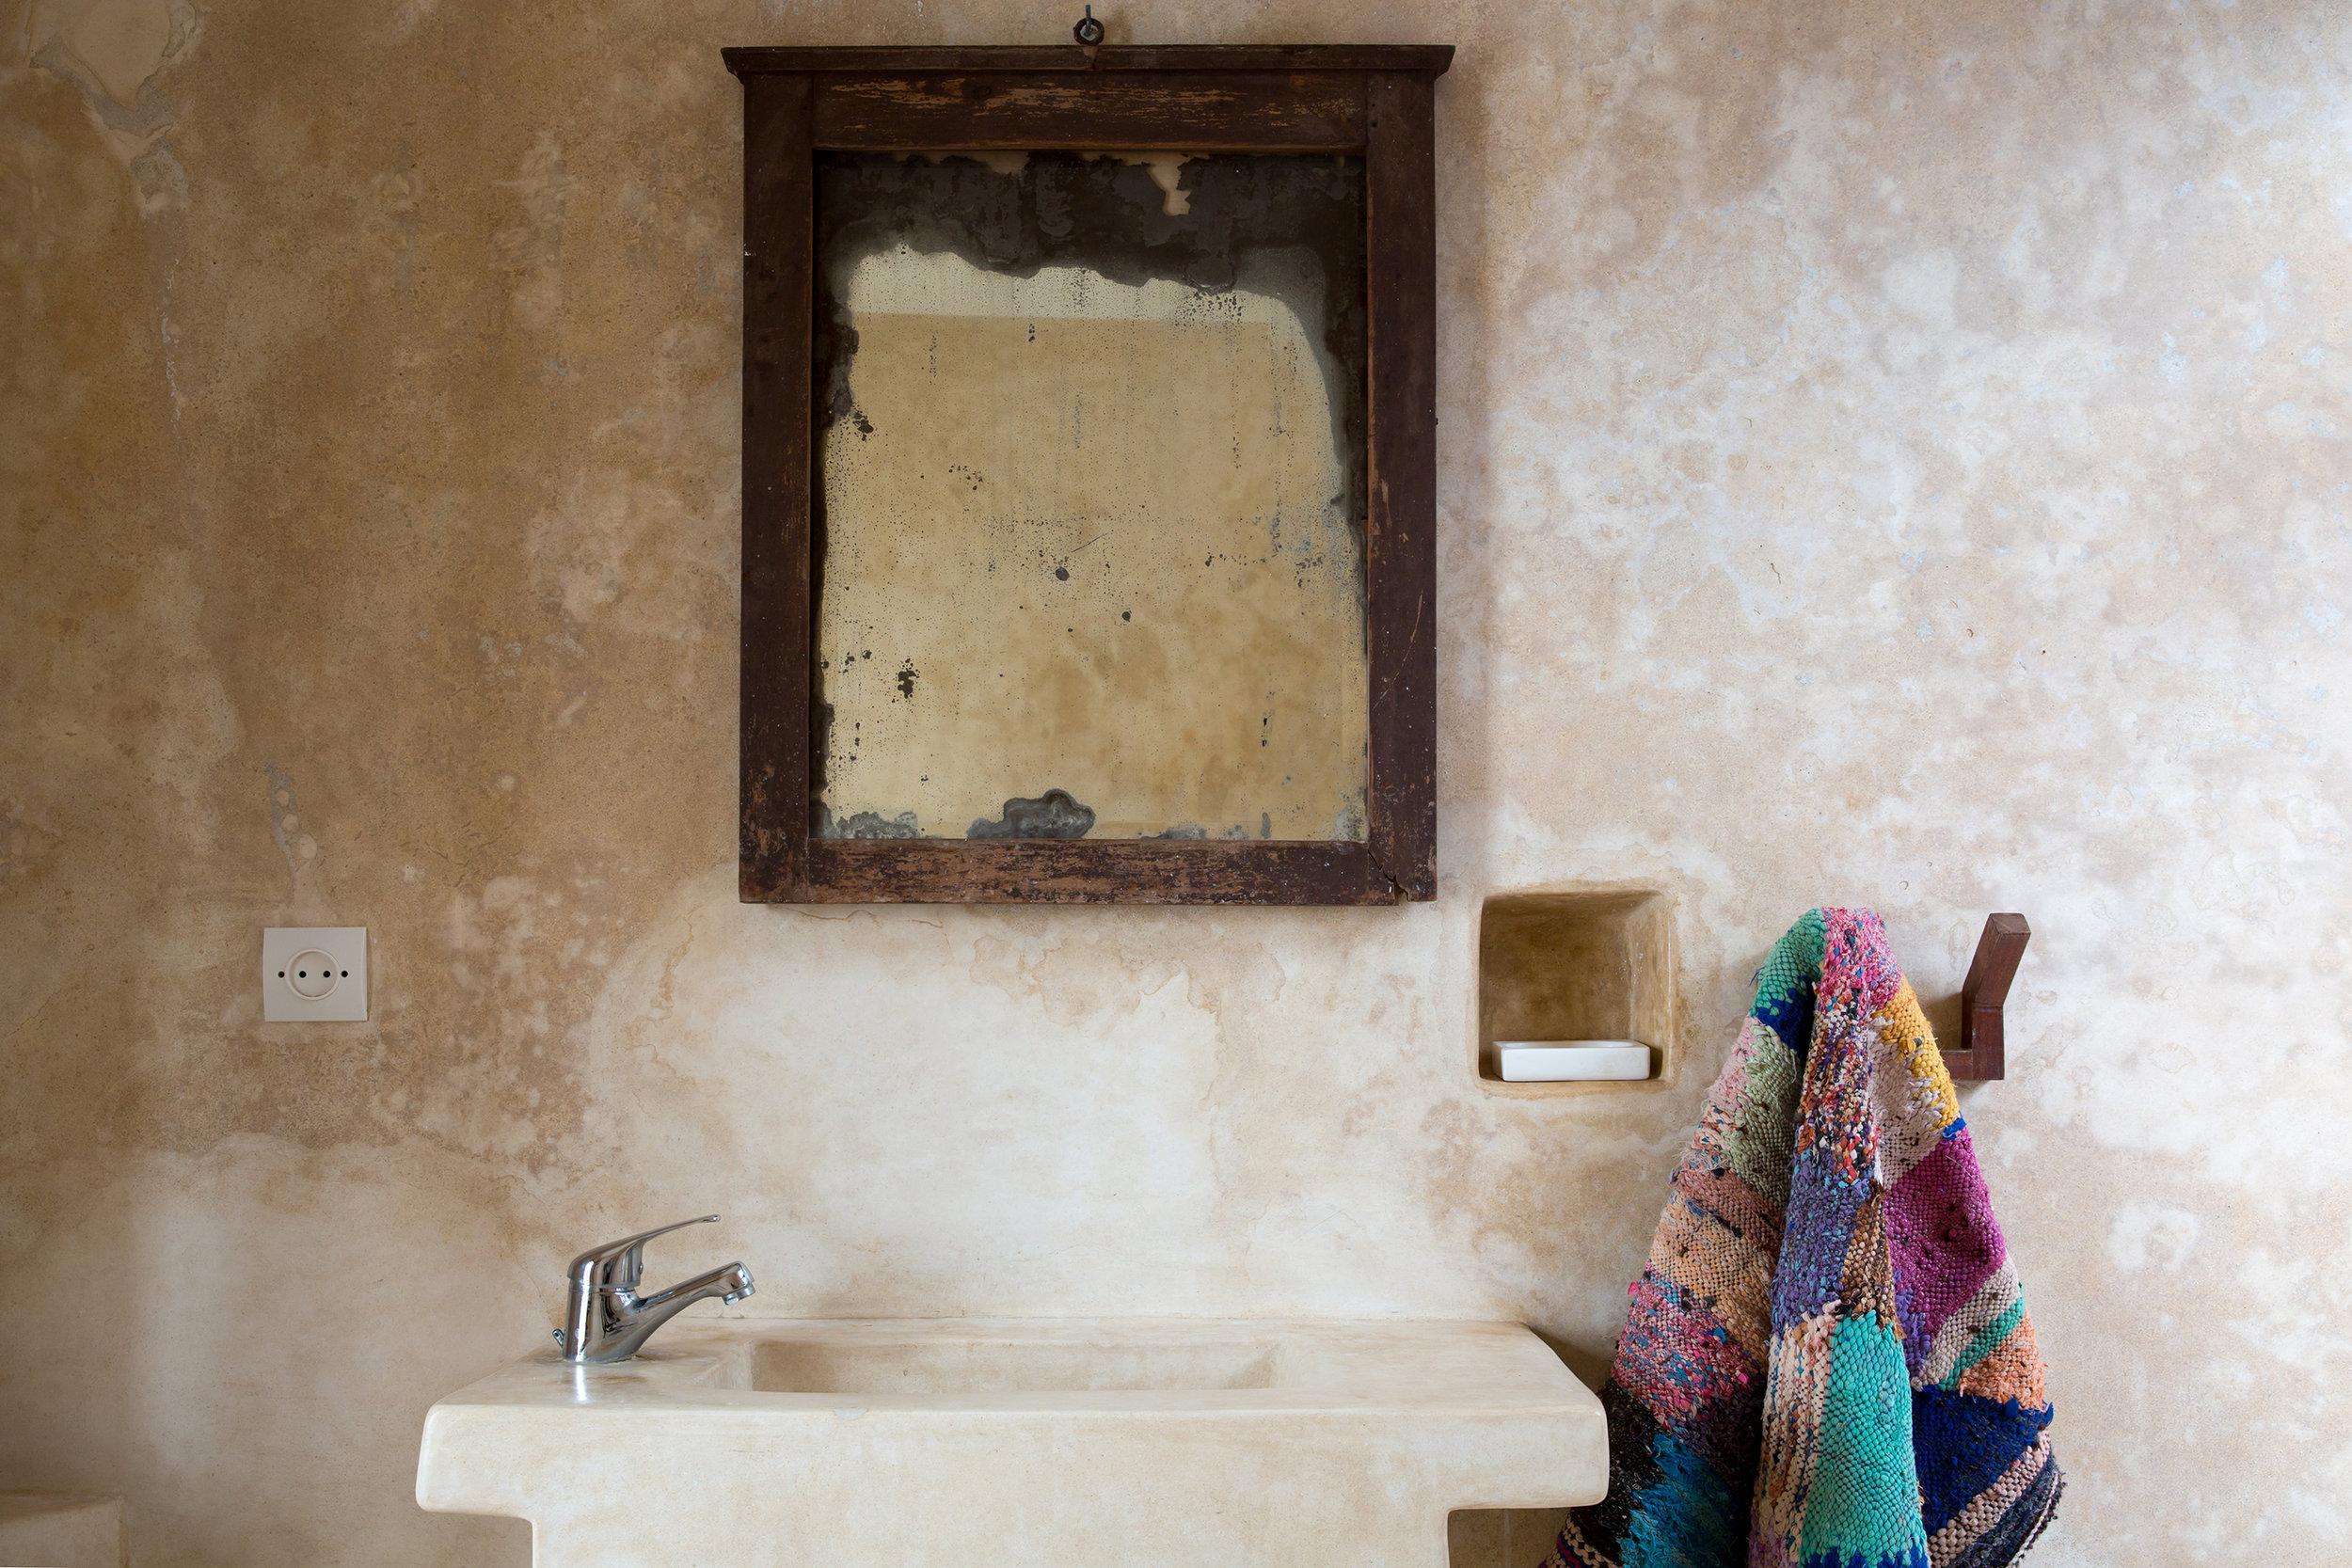 dar-emma-bathroom.jpg